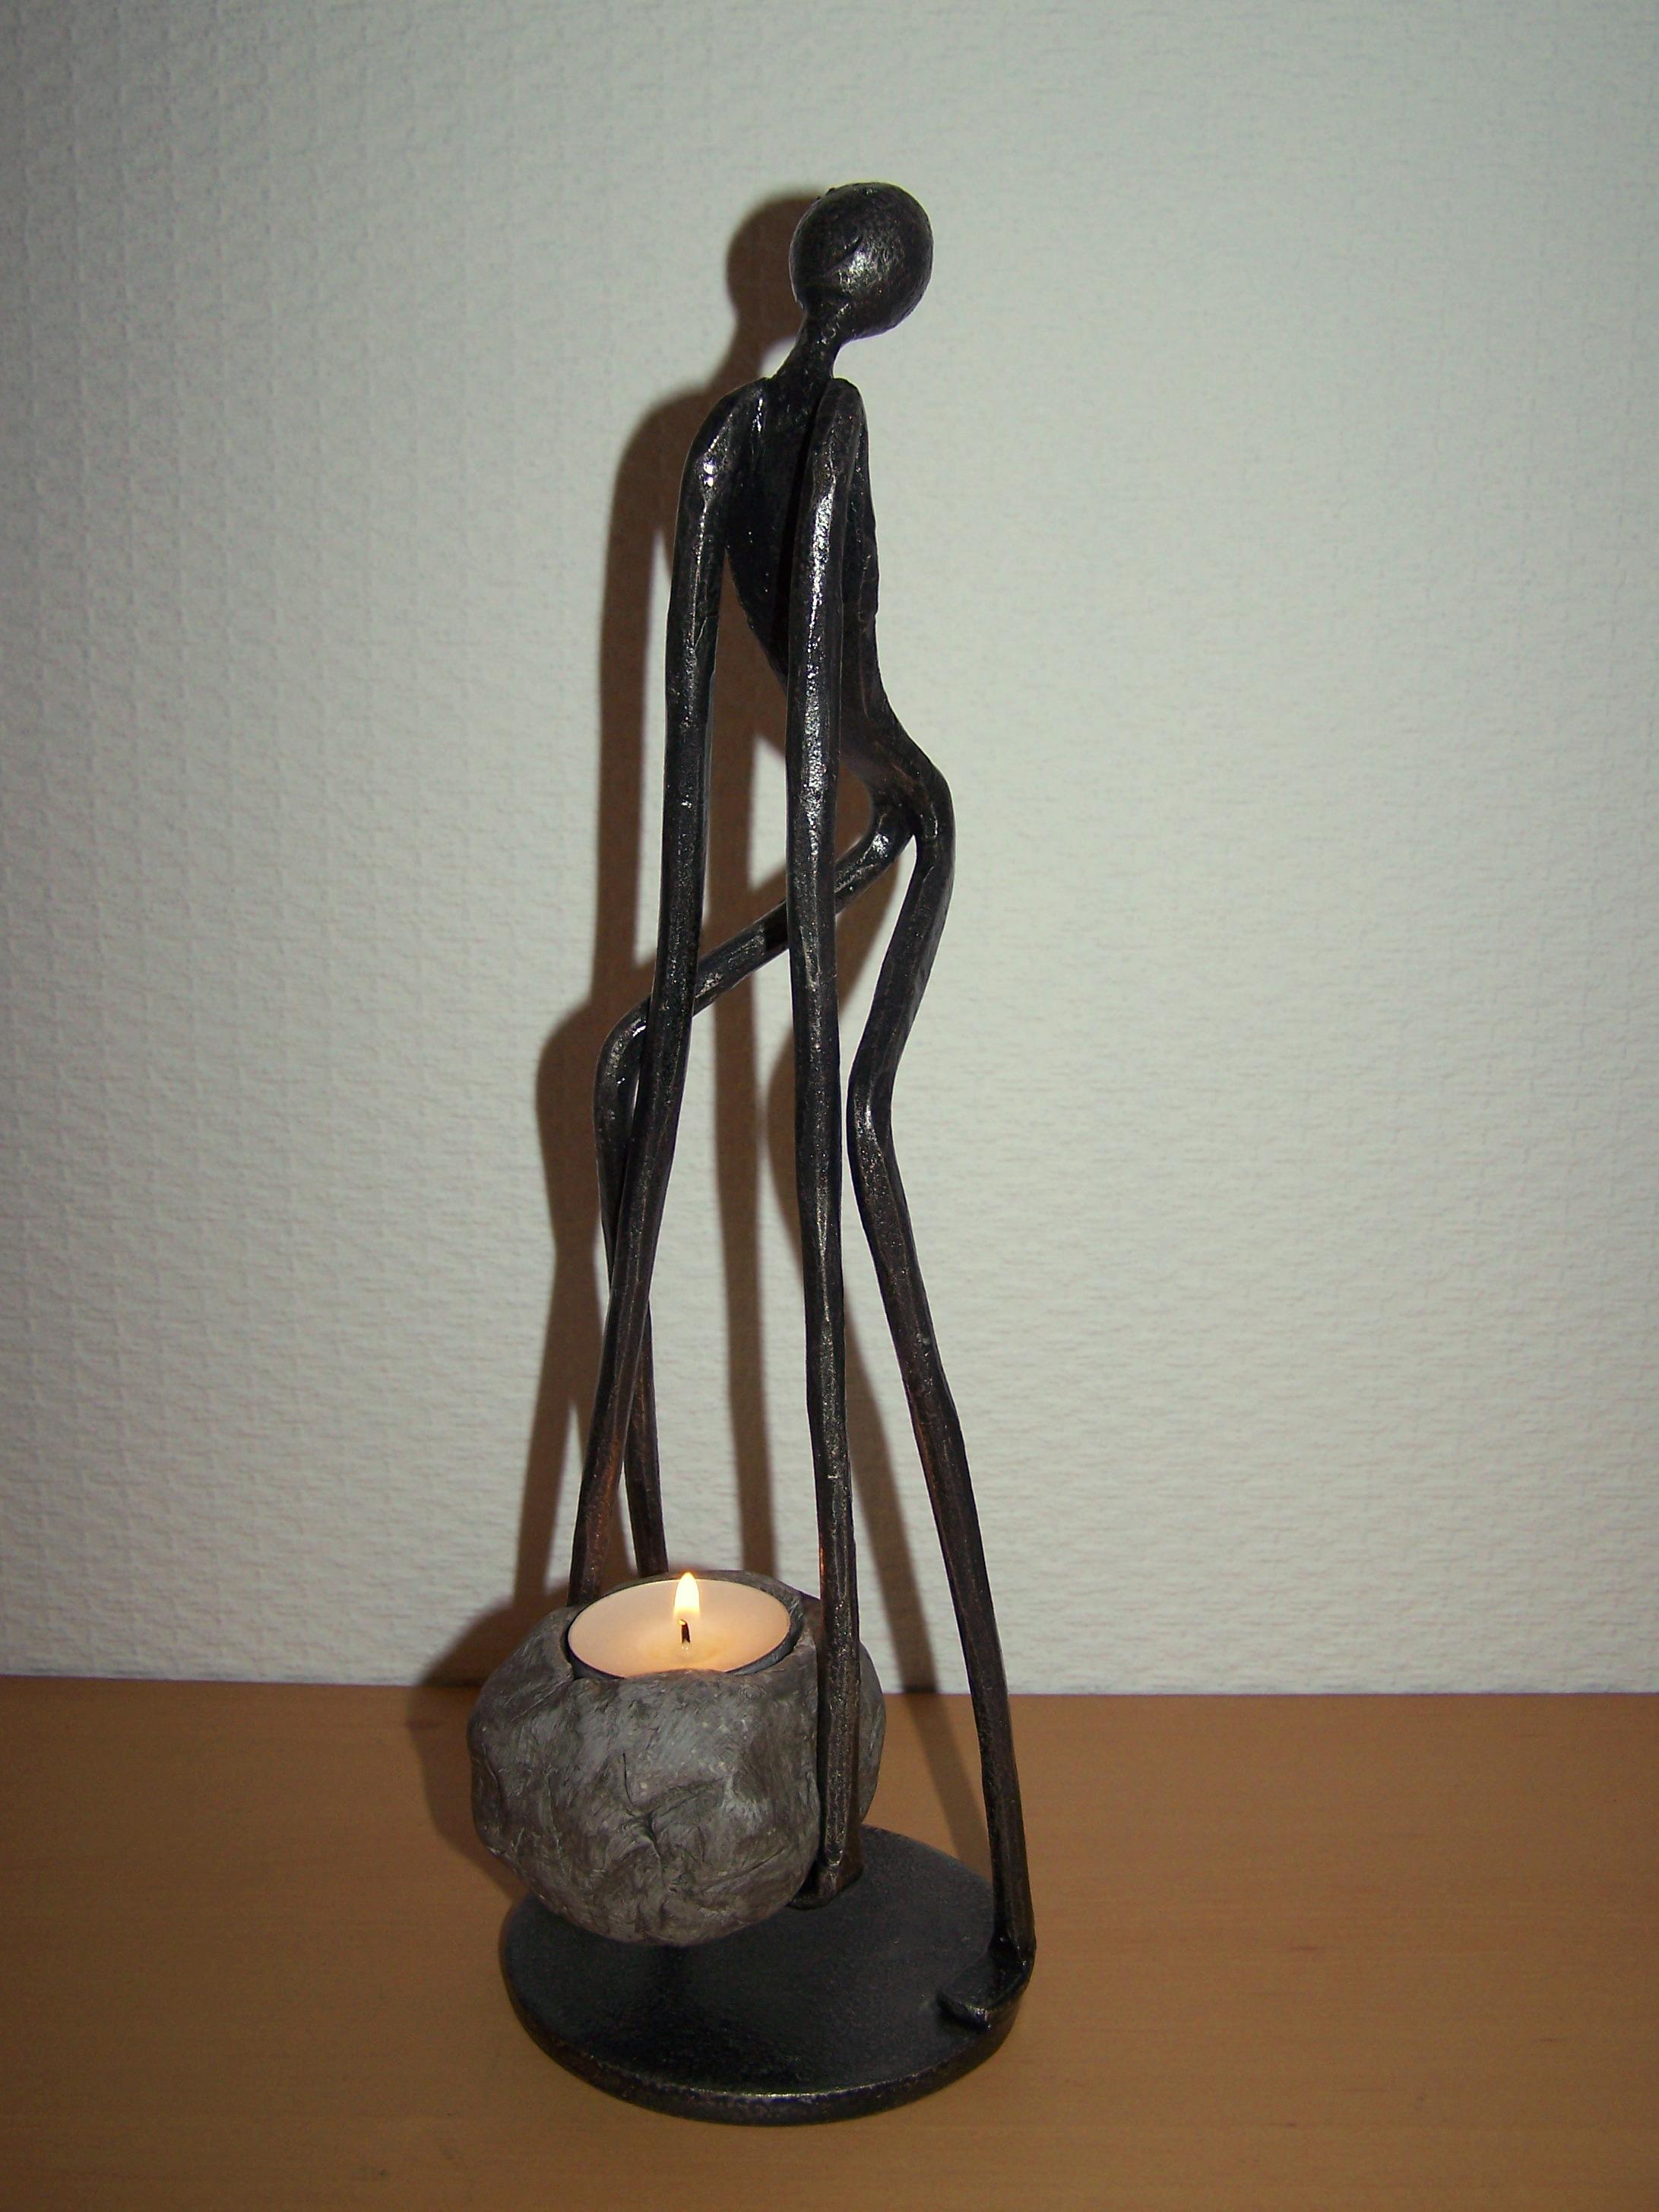 metaalsculptuur